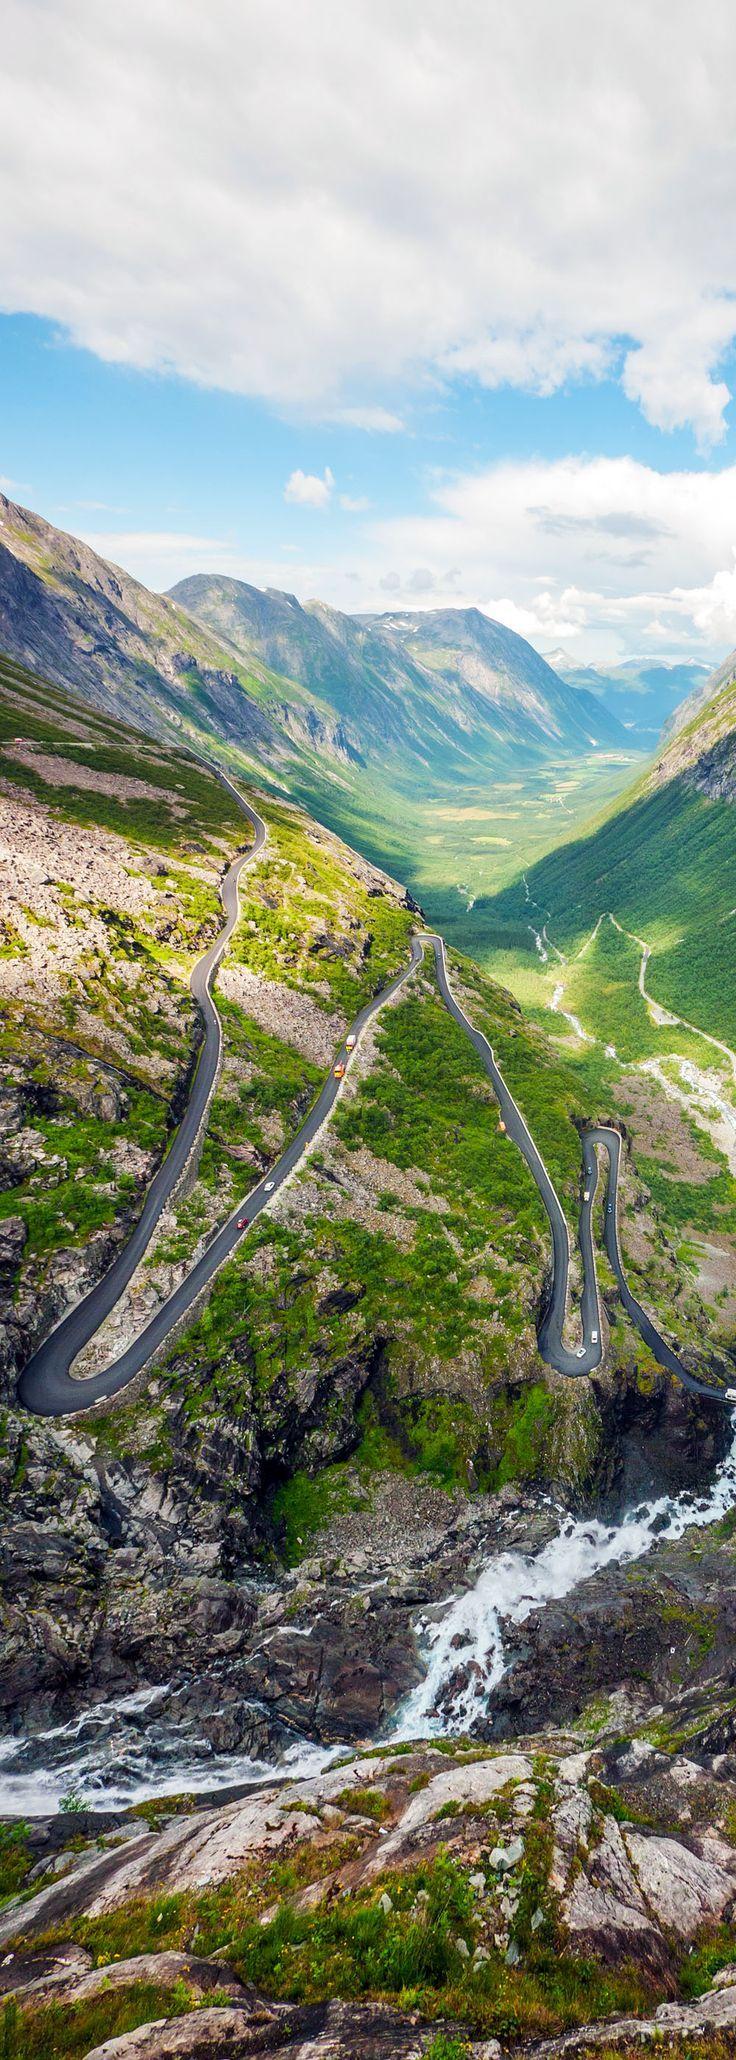 Trollstigen serpentine mountain road and Stigfossen waterfall. Part of Norwegian National Road. NORWAY